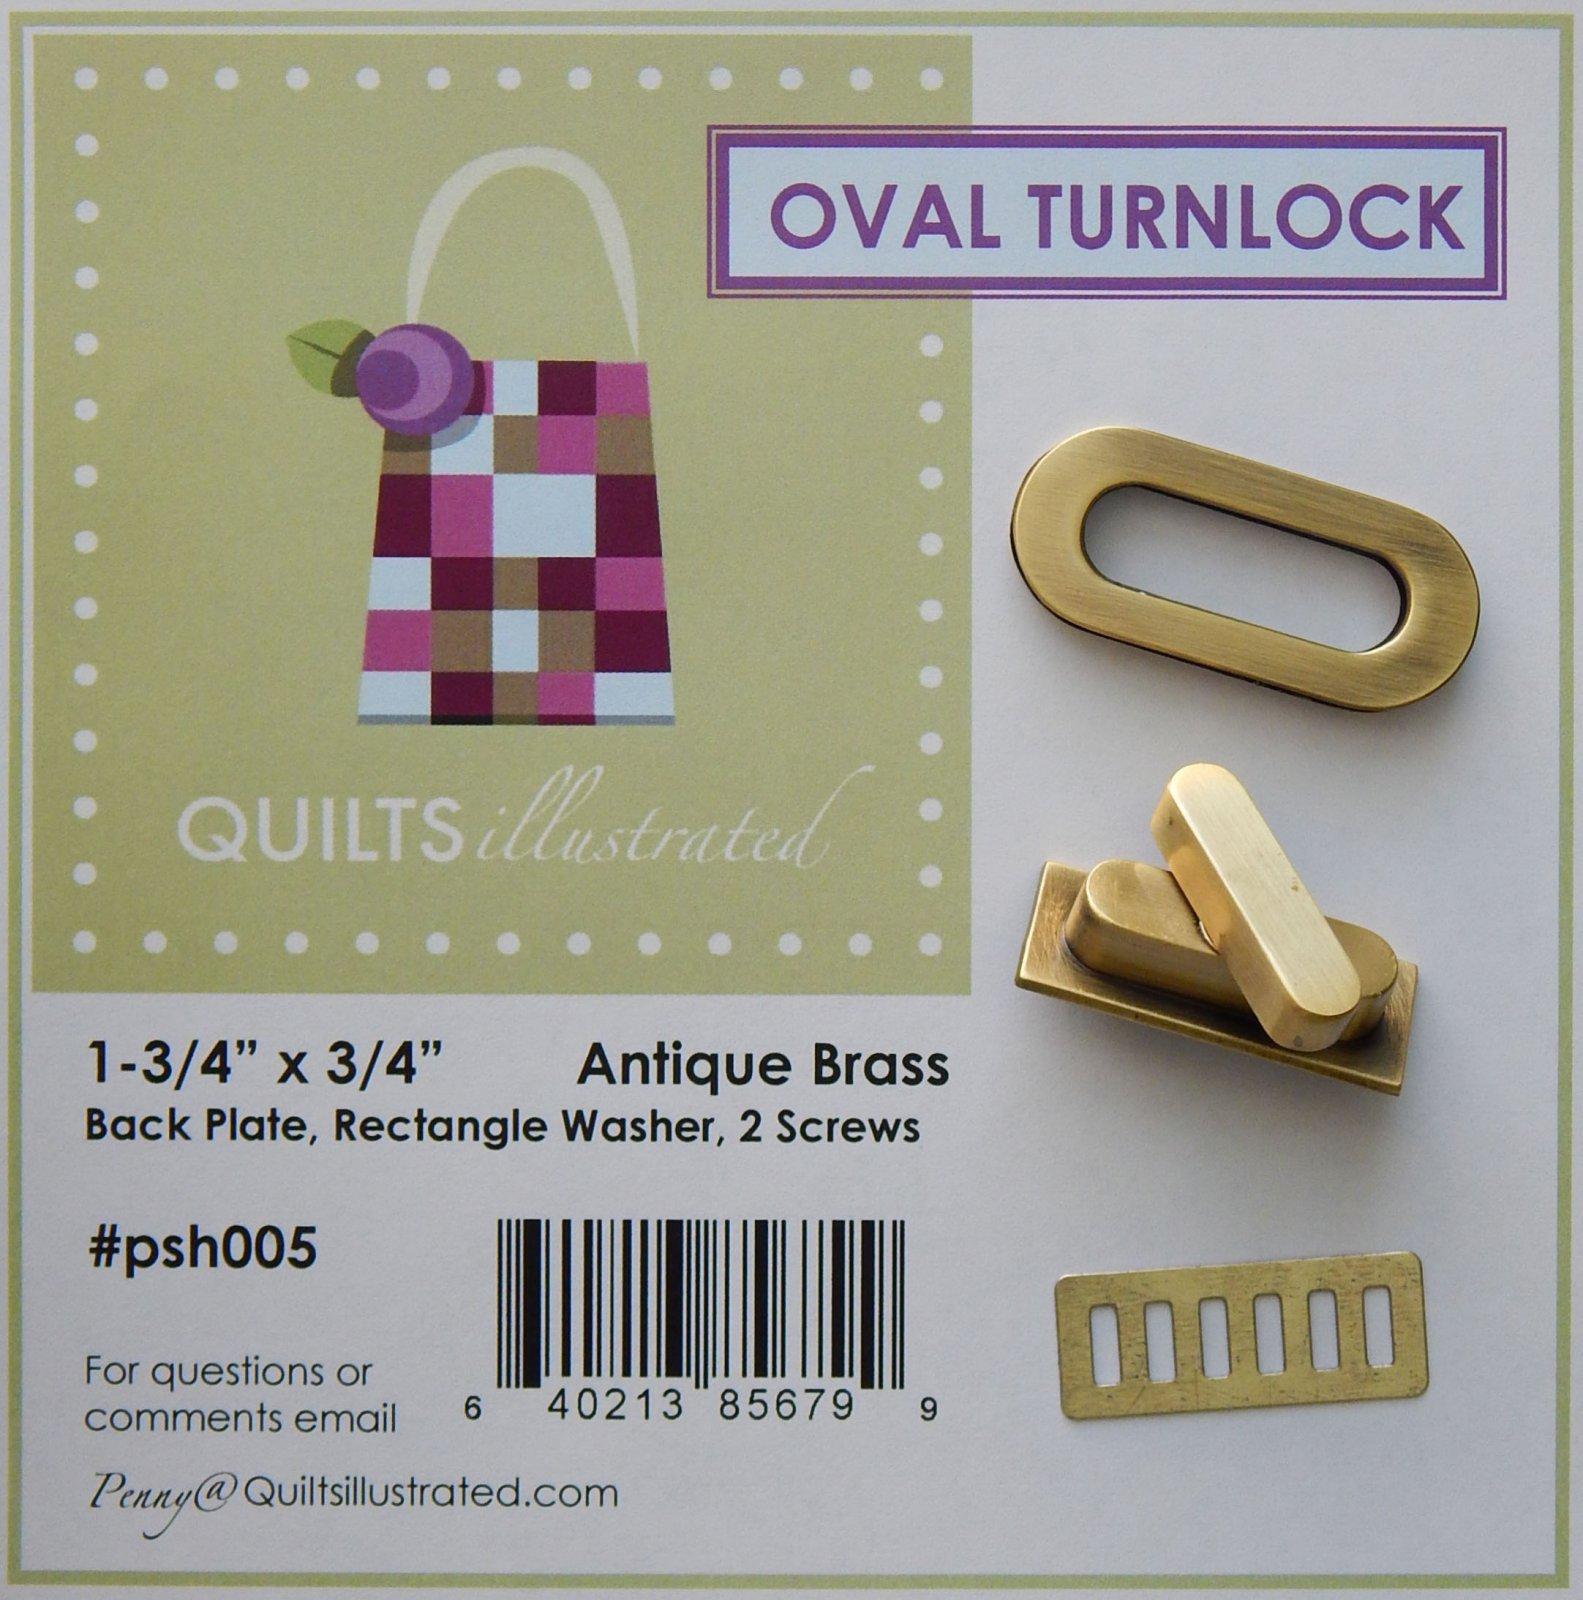 Oval Turnlock Set - Antique Brass